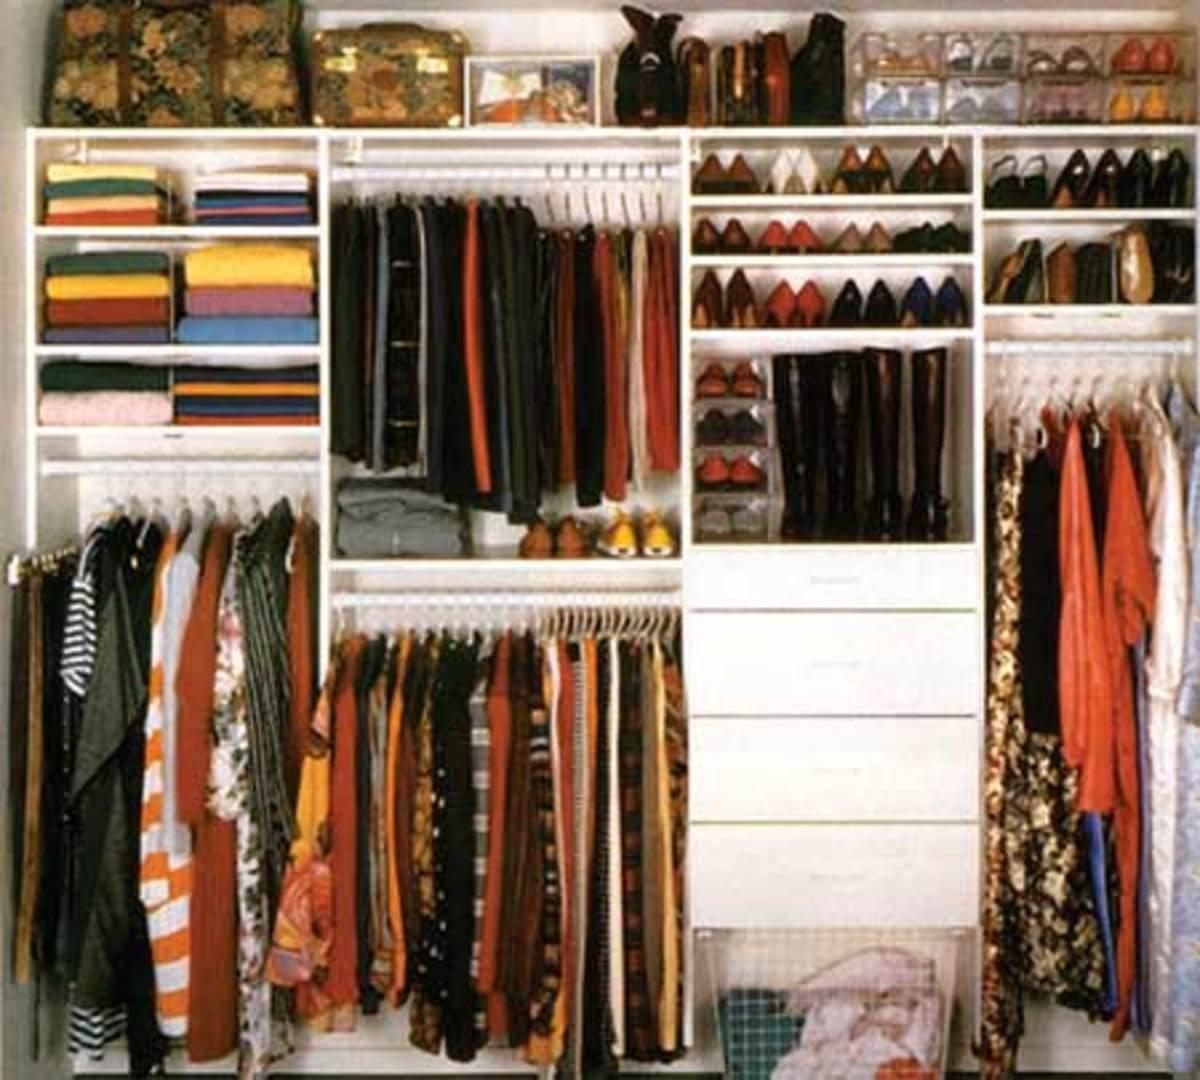 A Closet Organization System